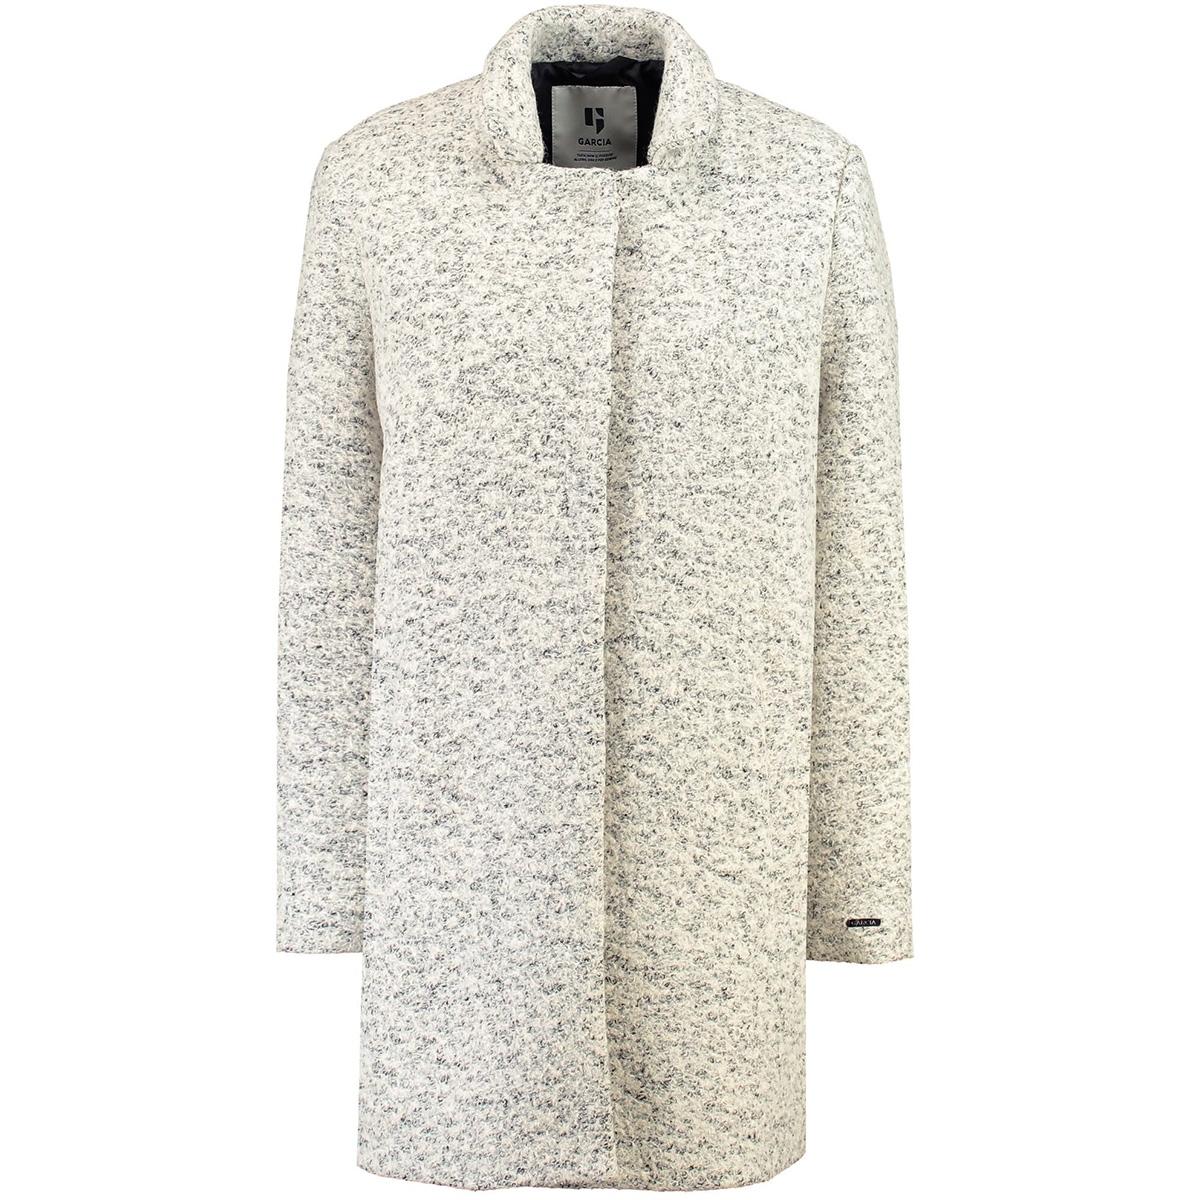 grijze gemeleerde mantel gj900914 garcia jas 1369 soft grey melee